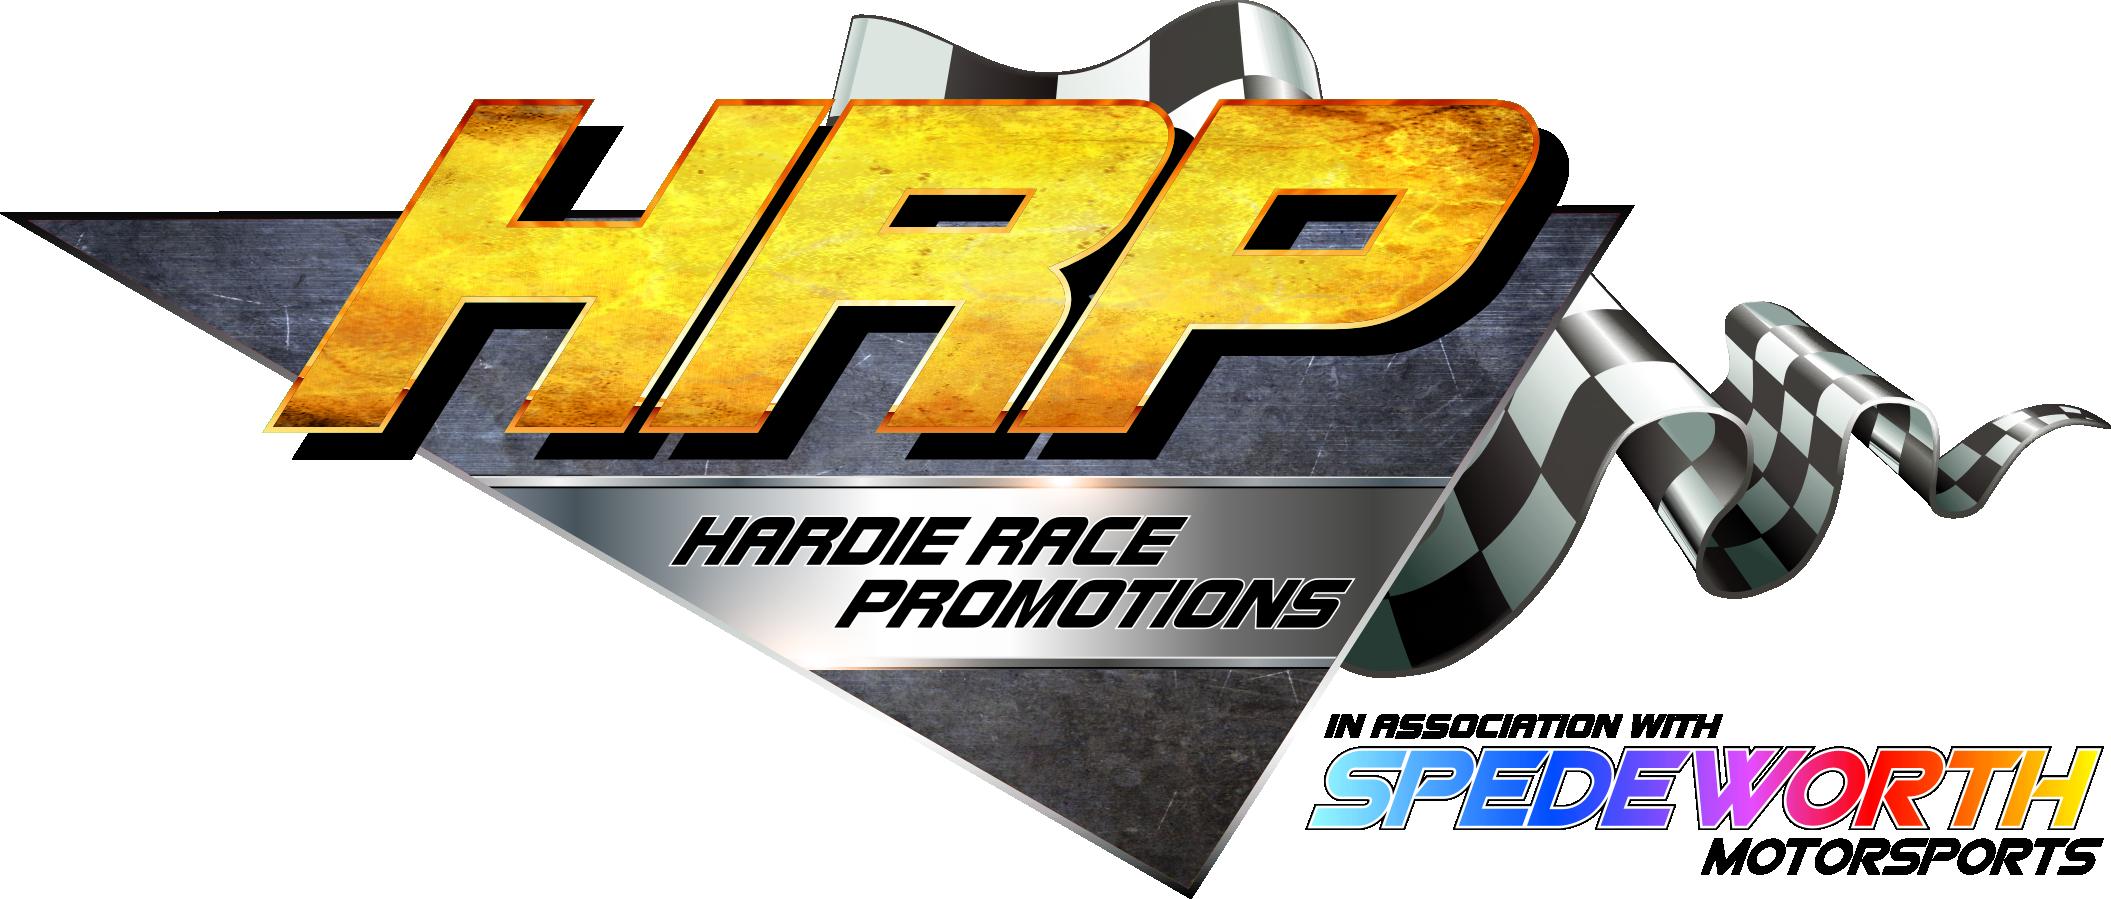 Hardie Race Promotions